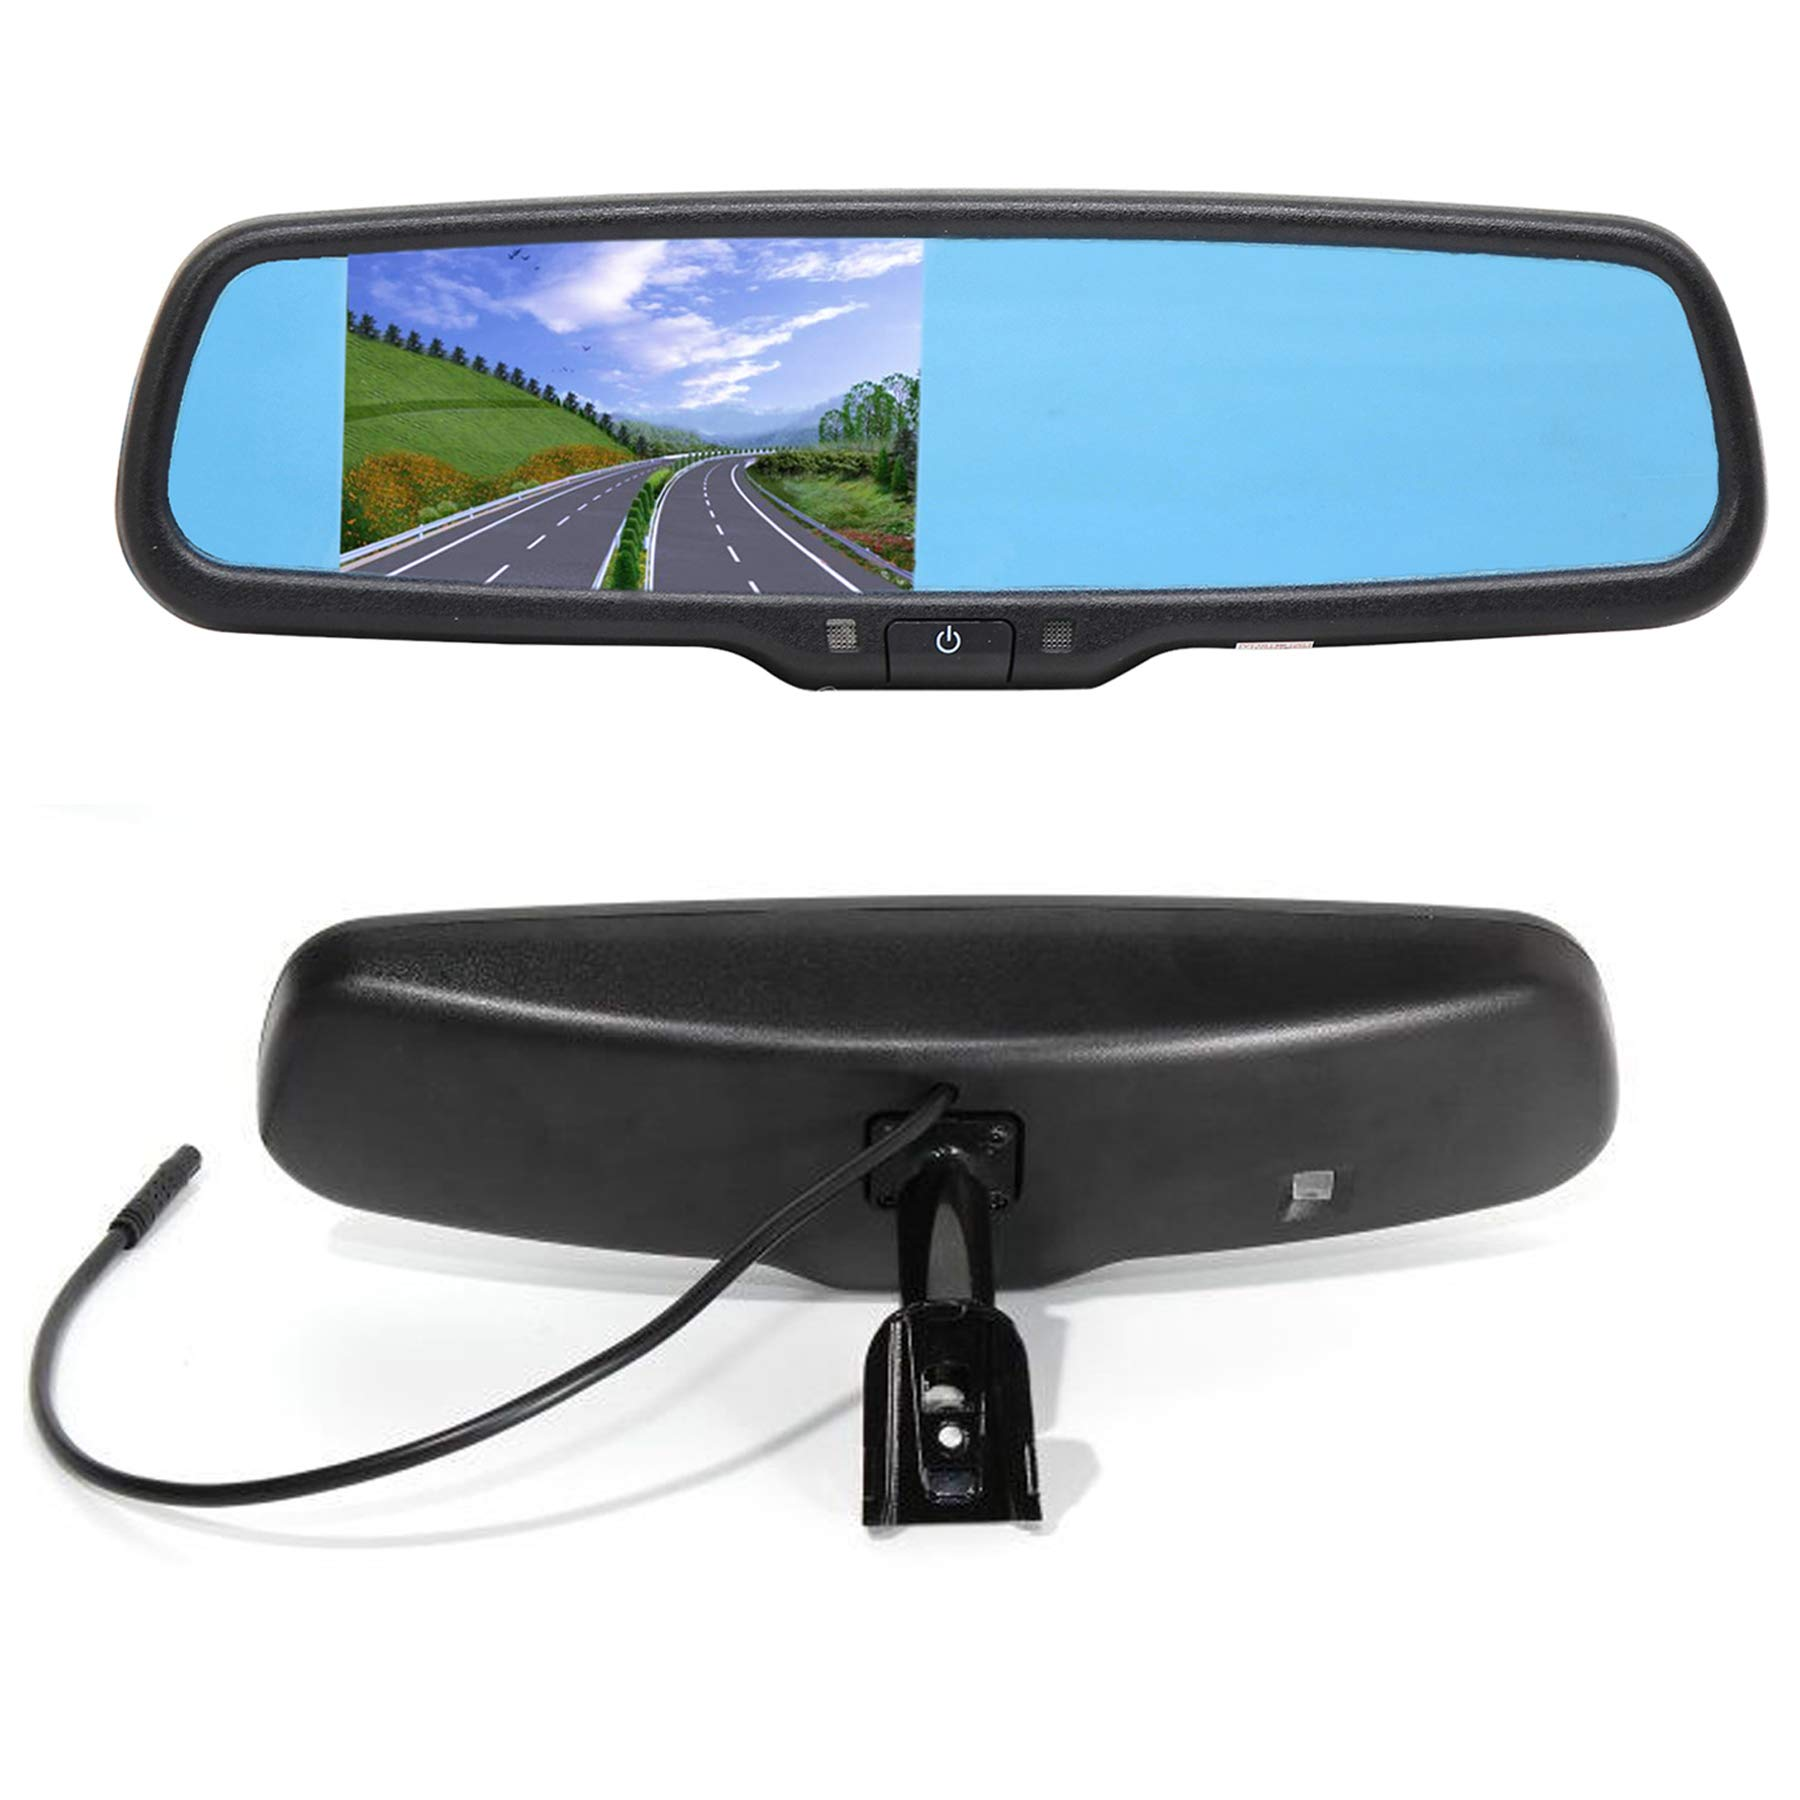 REDWOLF 4.3'' Interior Rear View Backup Mirror Monitor Anti-glare  Replacement W/ Dual Channel Fit Ford F150 2004-2014, F250/350 04-2015, Toyota Tacoma 2011-2015, Corolla 2008-2014, RAV4 2009-2014